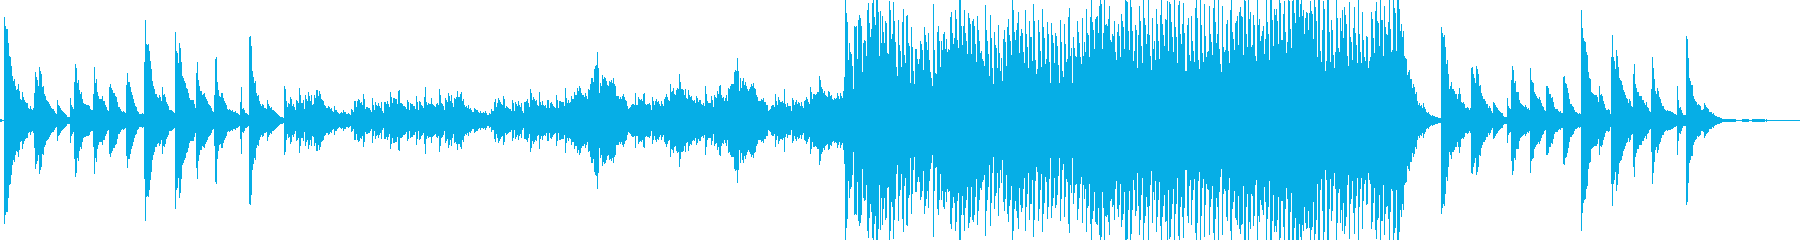 Winter,Piano,Orchestの再生済みの波形